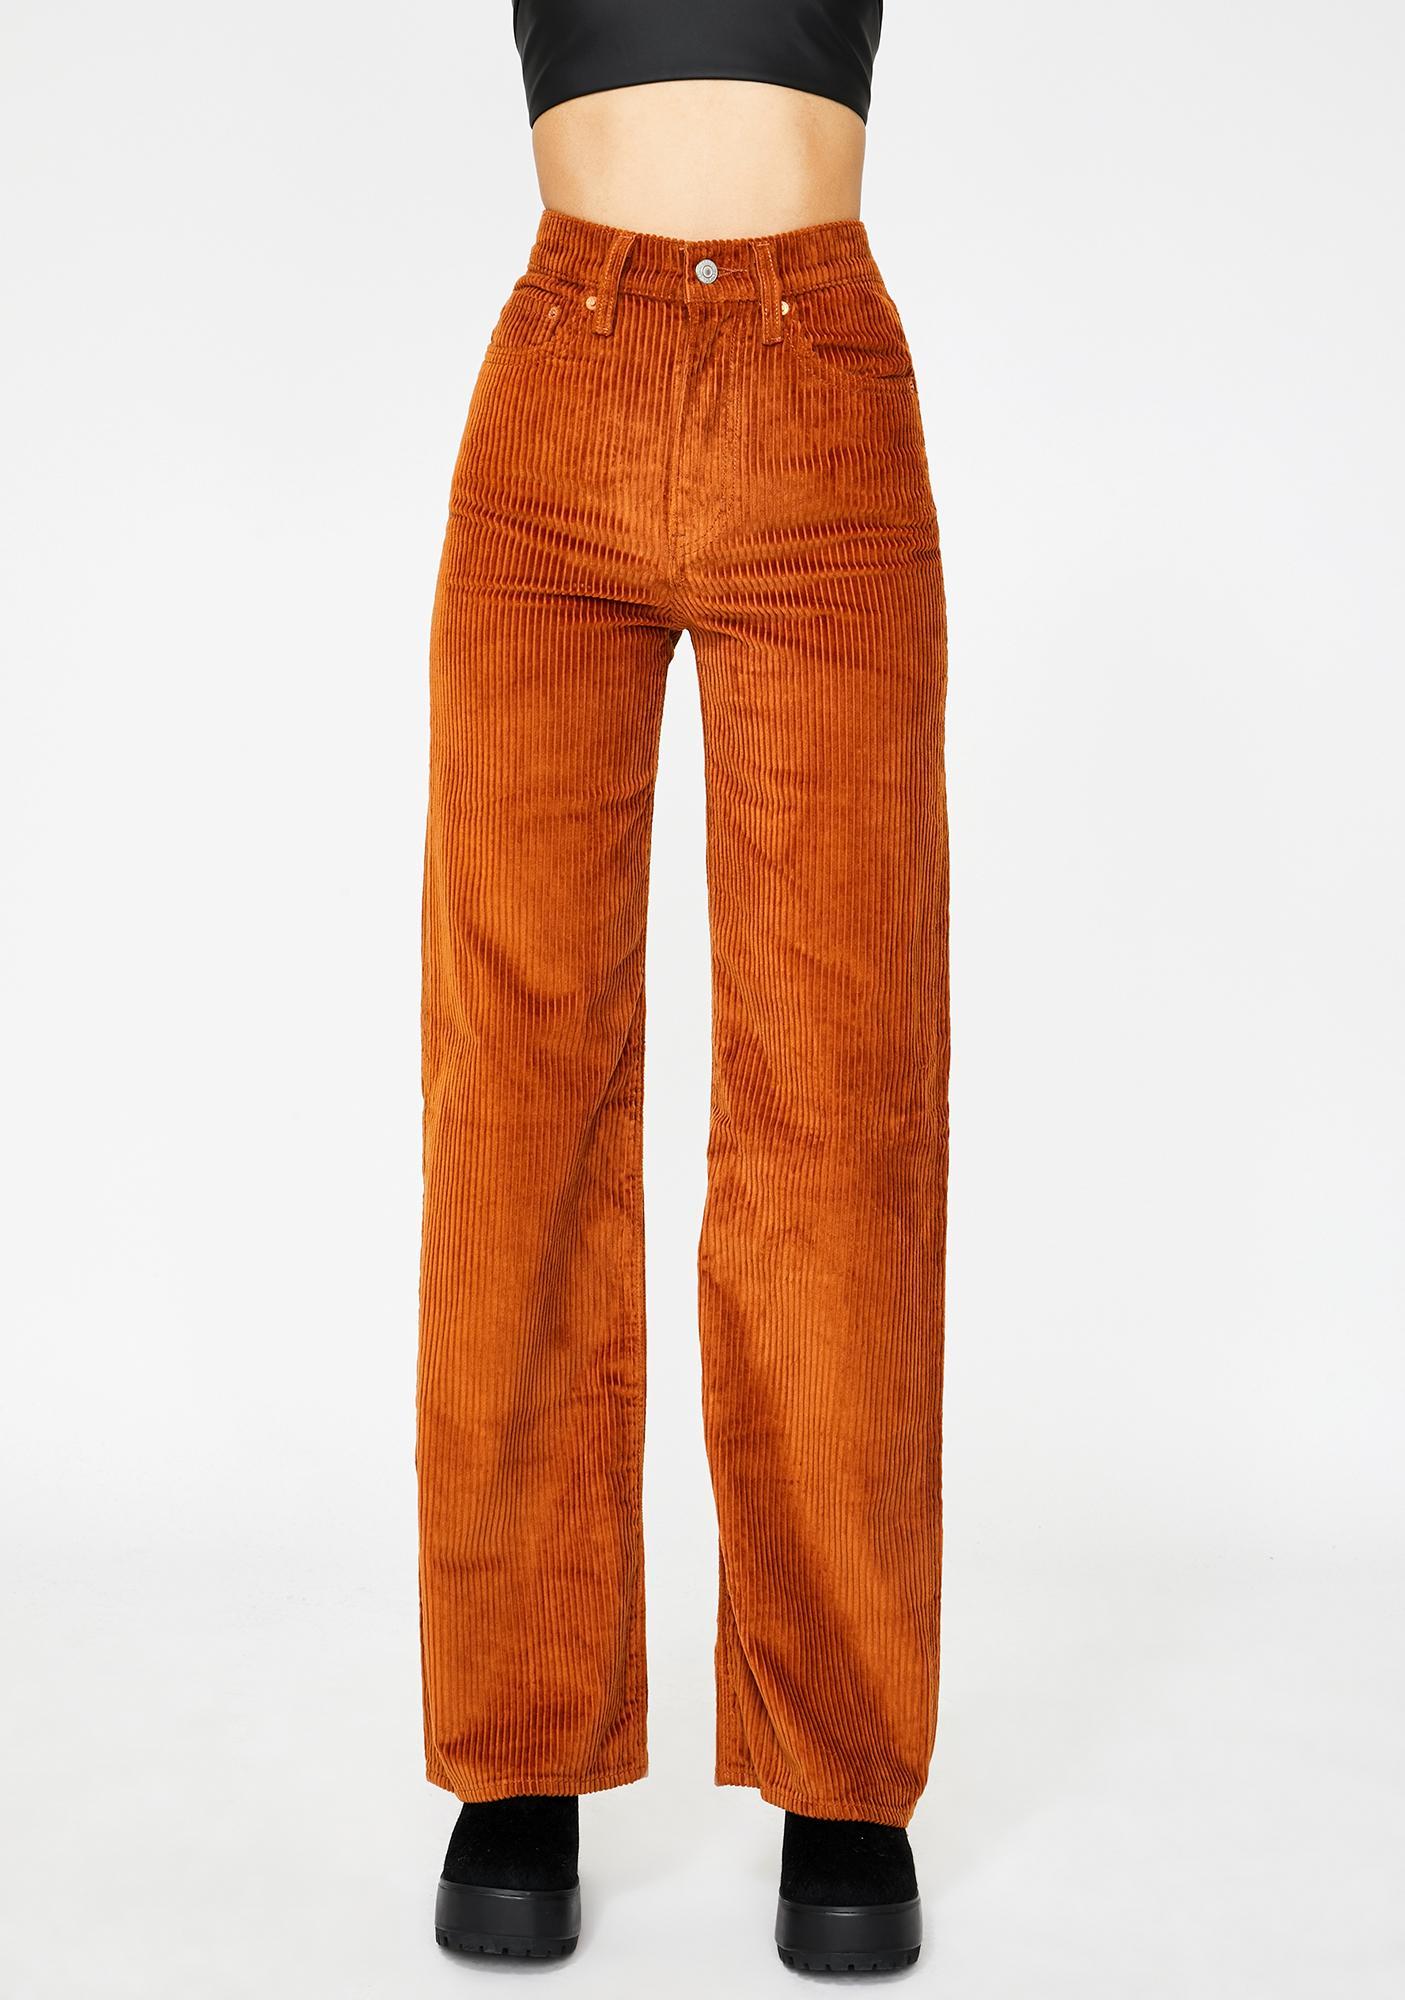 Levis Caramel Ribcage Wide Leg Corduroy Pants